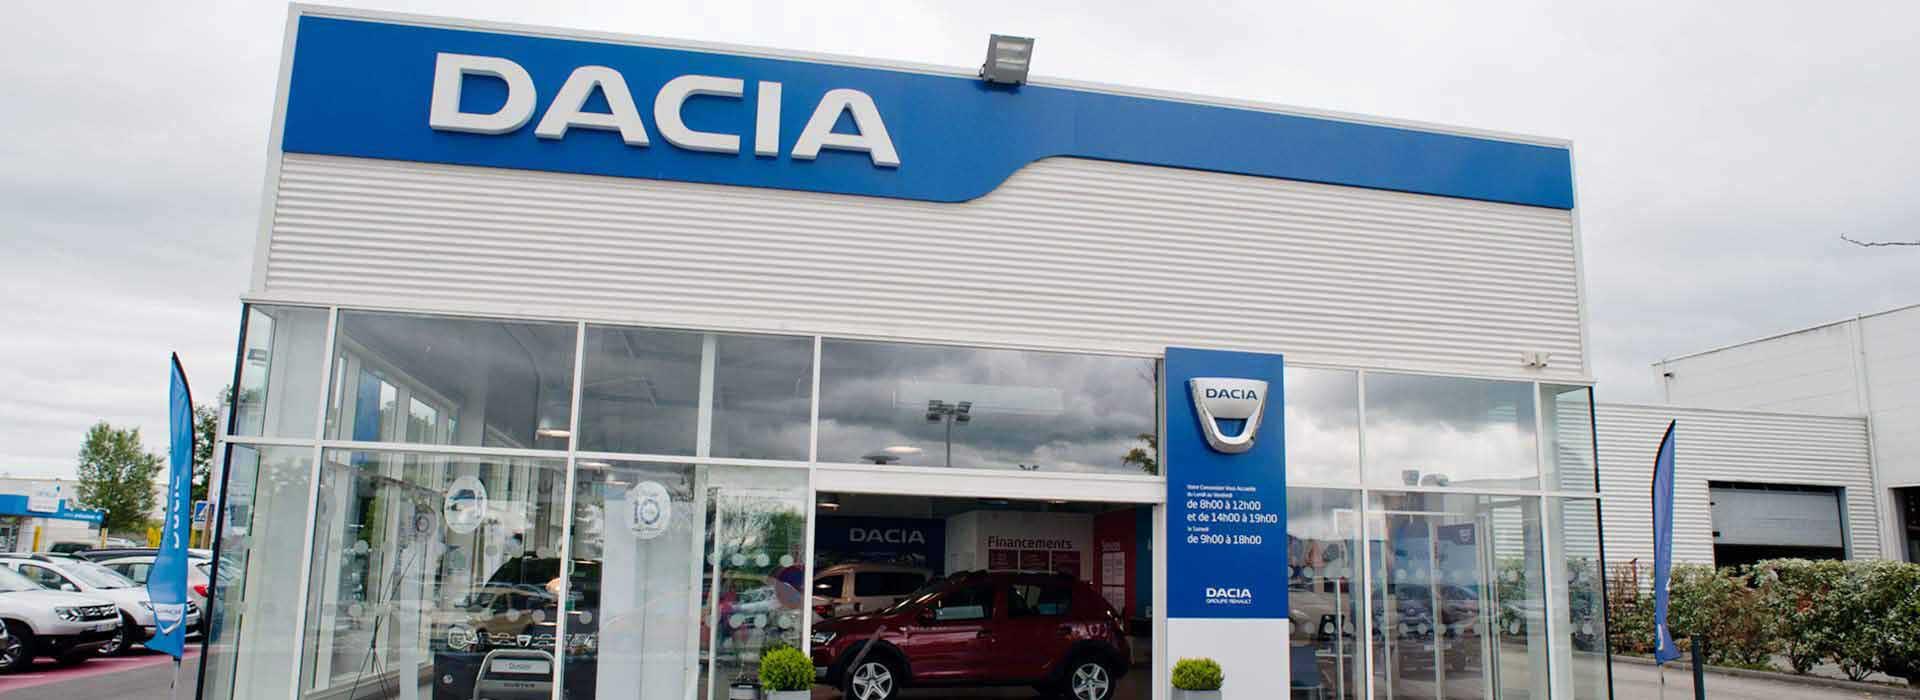 Dacia Annemasse